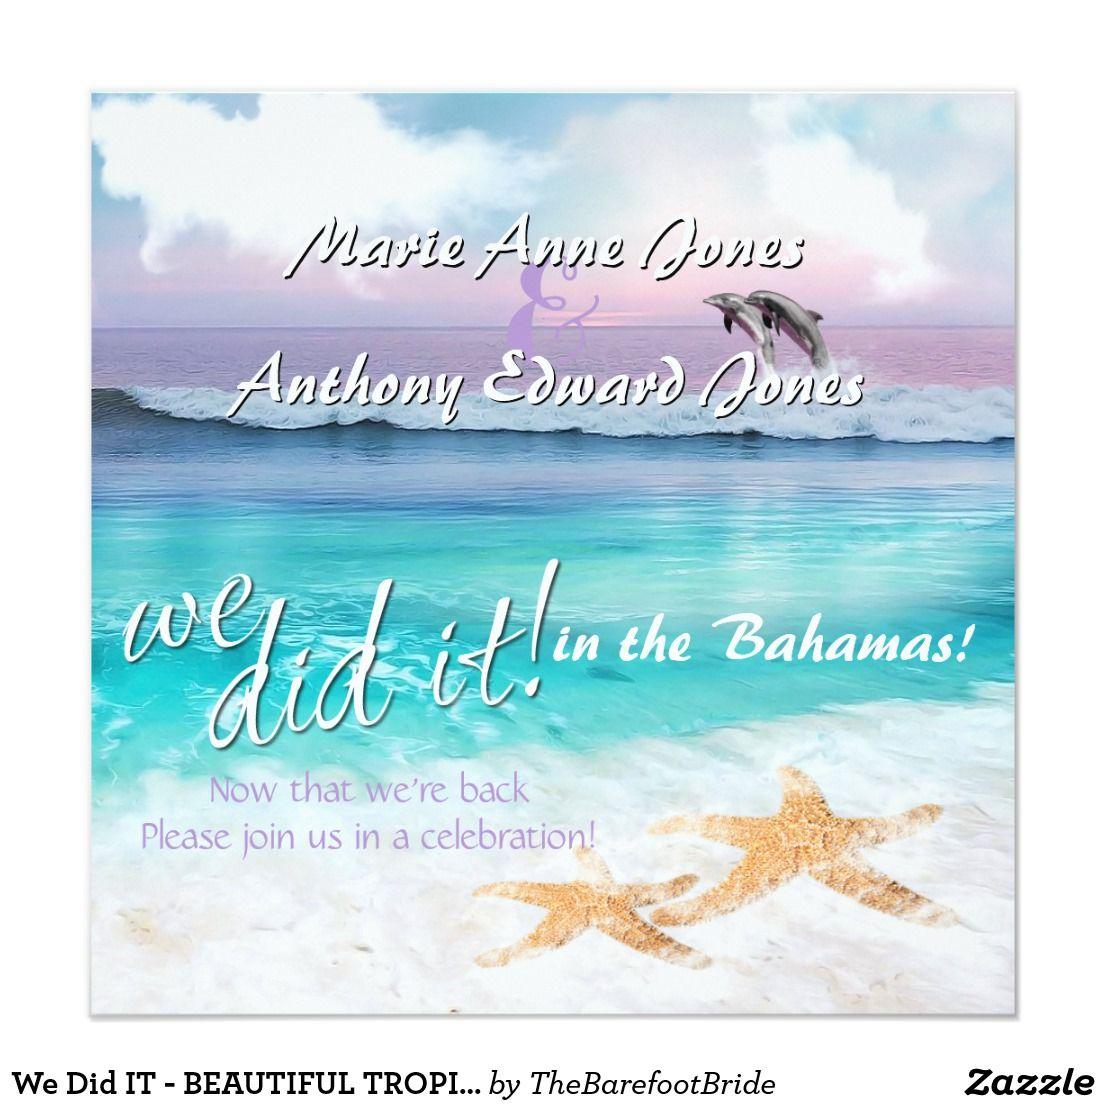 We Did IT BEAUTIFUL TROPICAL OCEAN SUNRISE Invitation